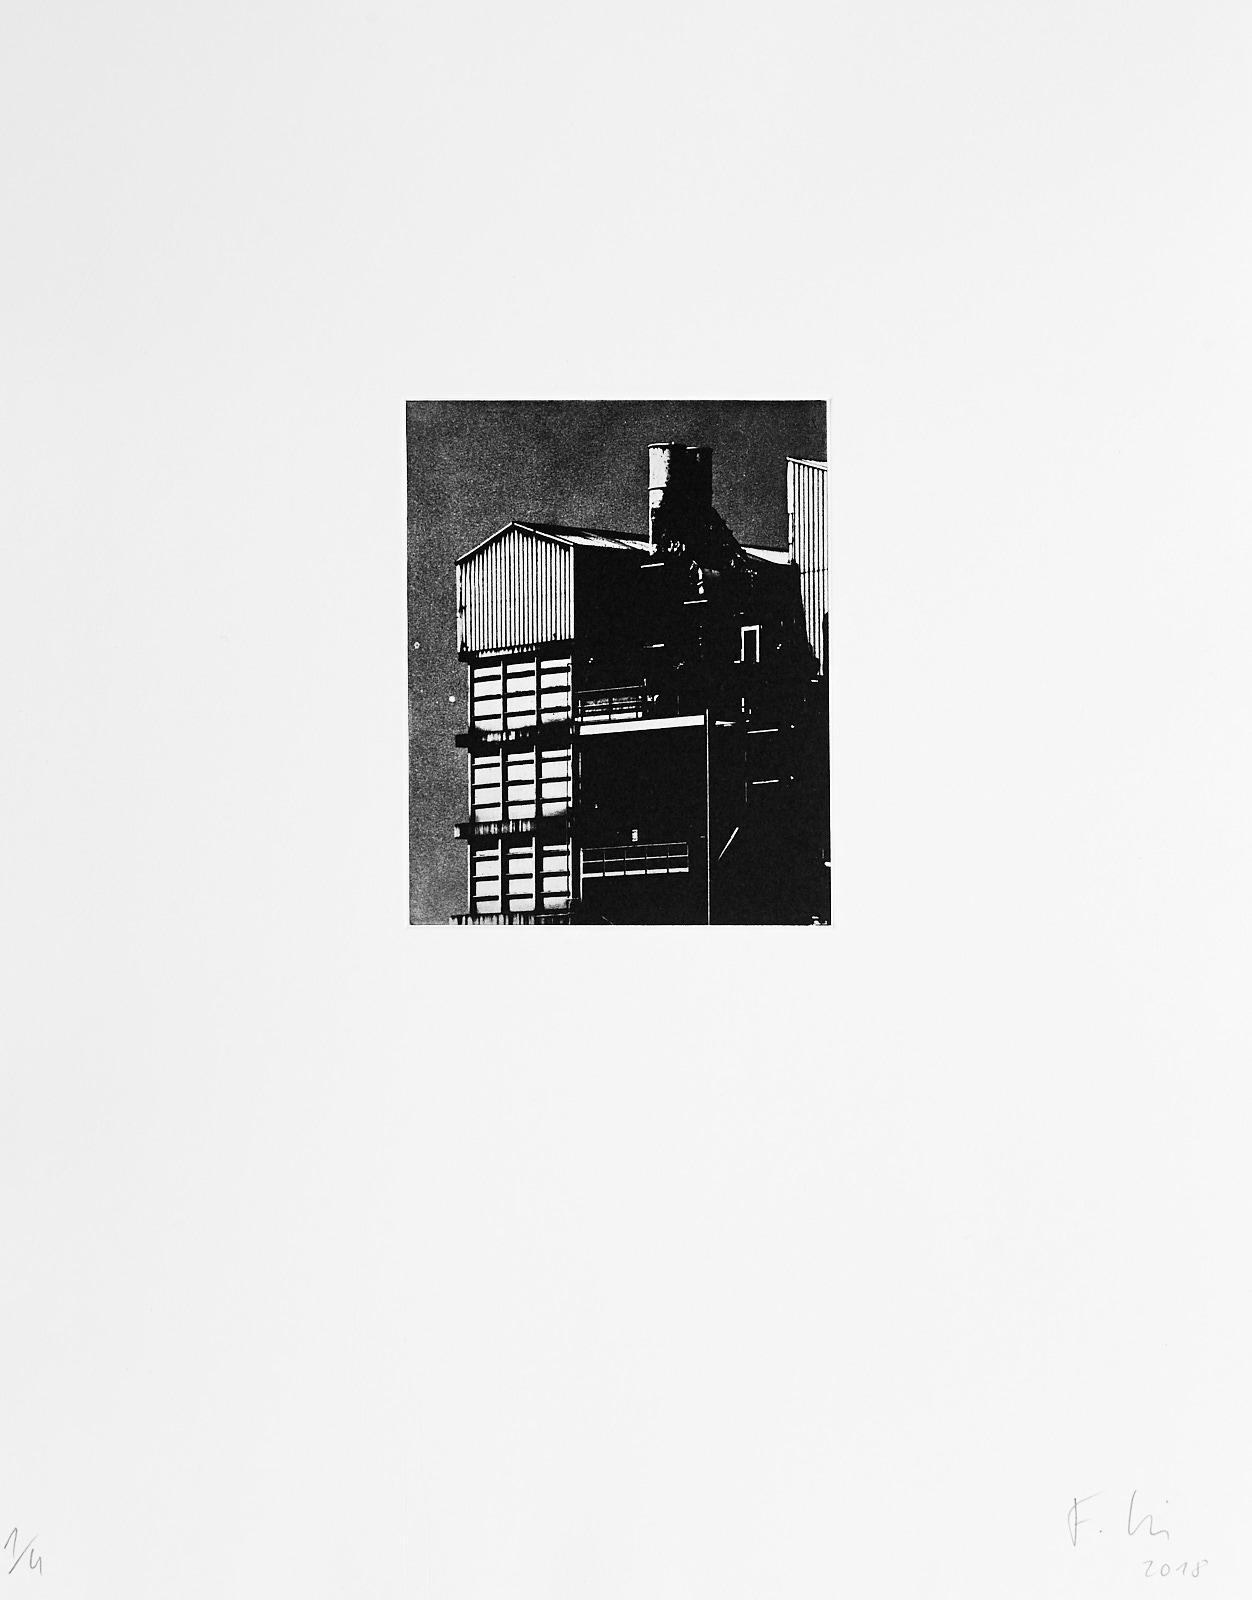 o.T.[Typologien#1]  (2018)  medium: Photogravure  size: 36 x 46 cm  paper: Zerkall 270 g/qm  plate: 11.7 x 14.7 cm  edition: 6 copies  numbered: 1/4 - 4/4, 2 e.a.  printer: FWU